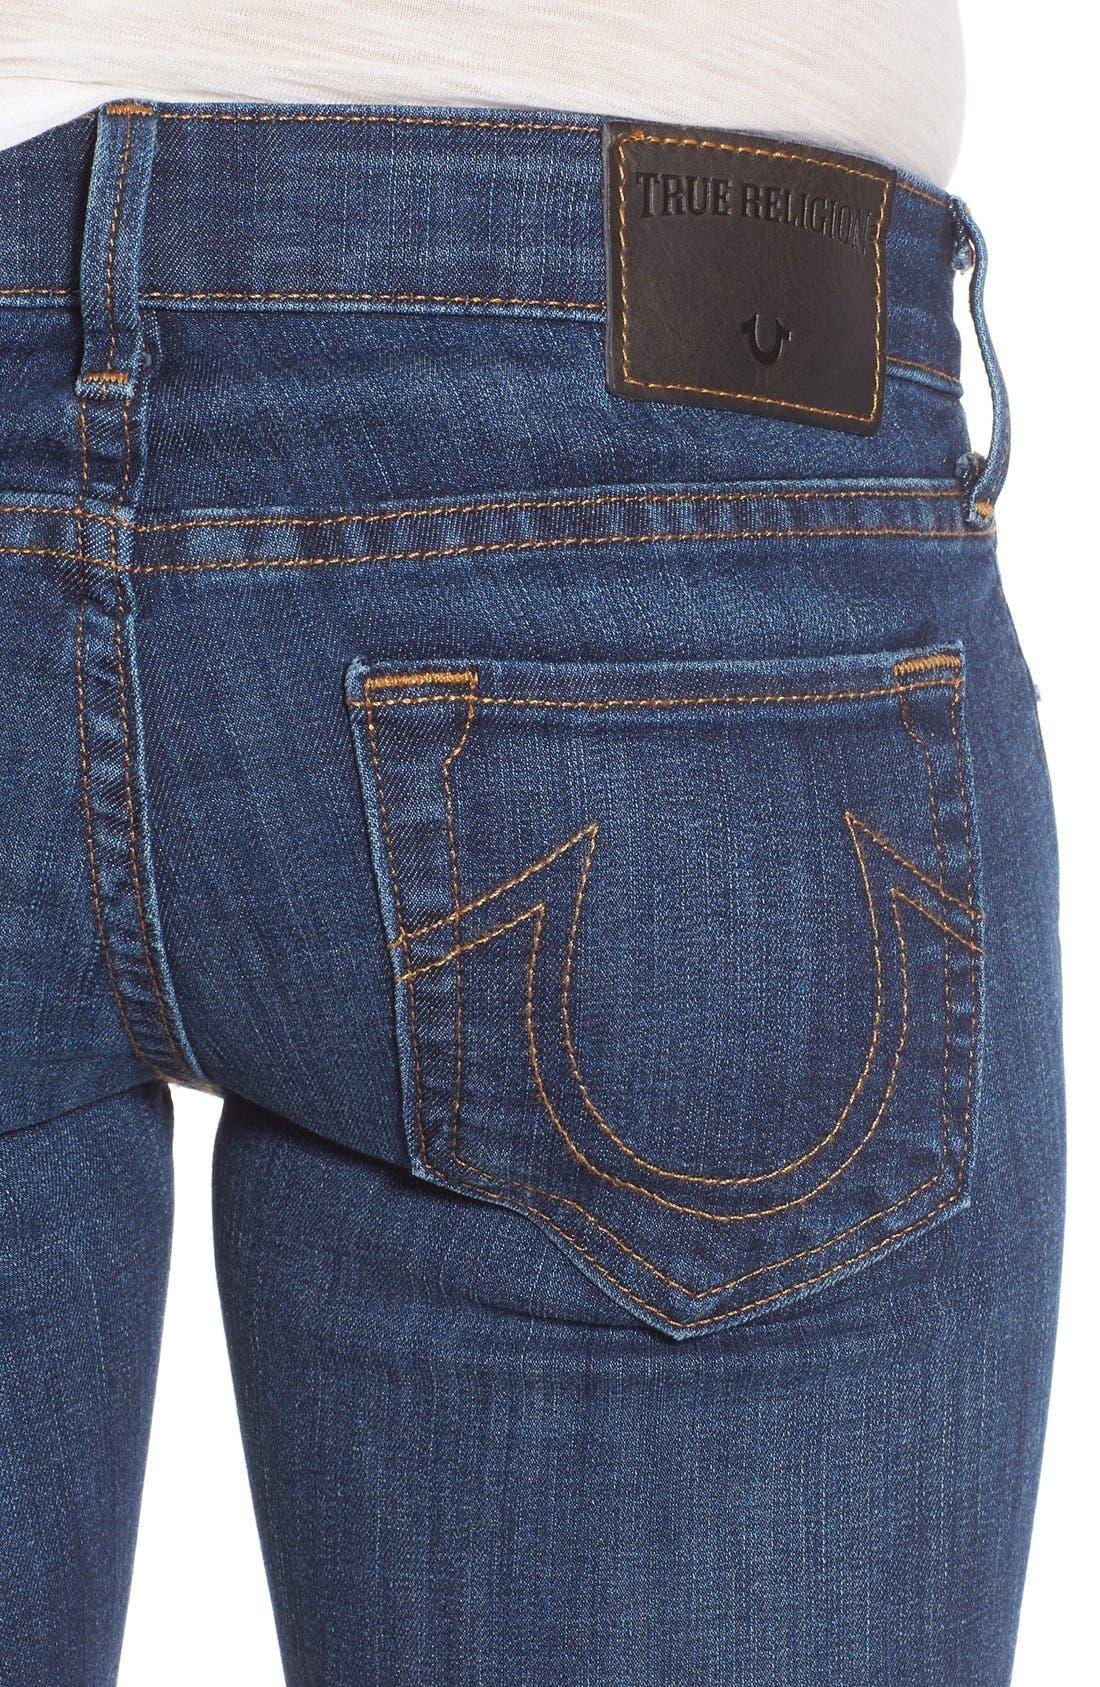 Alternate Image 4  - True Religion Brand Jeans 'Karlie' Bell Bottom Jeans (Worn Vintage)